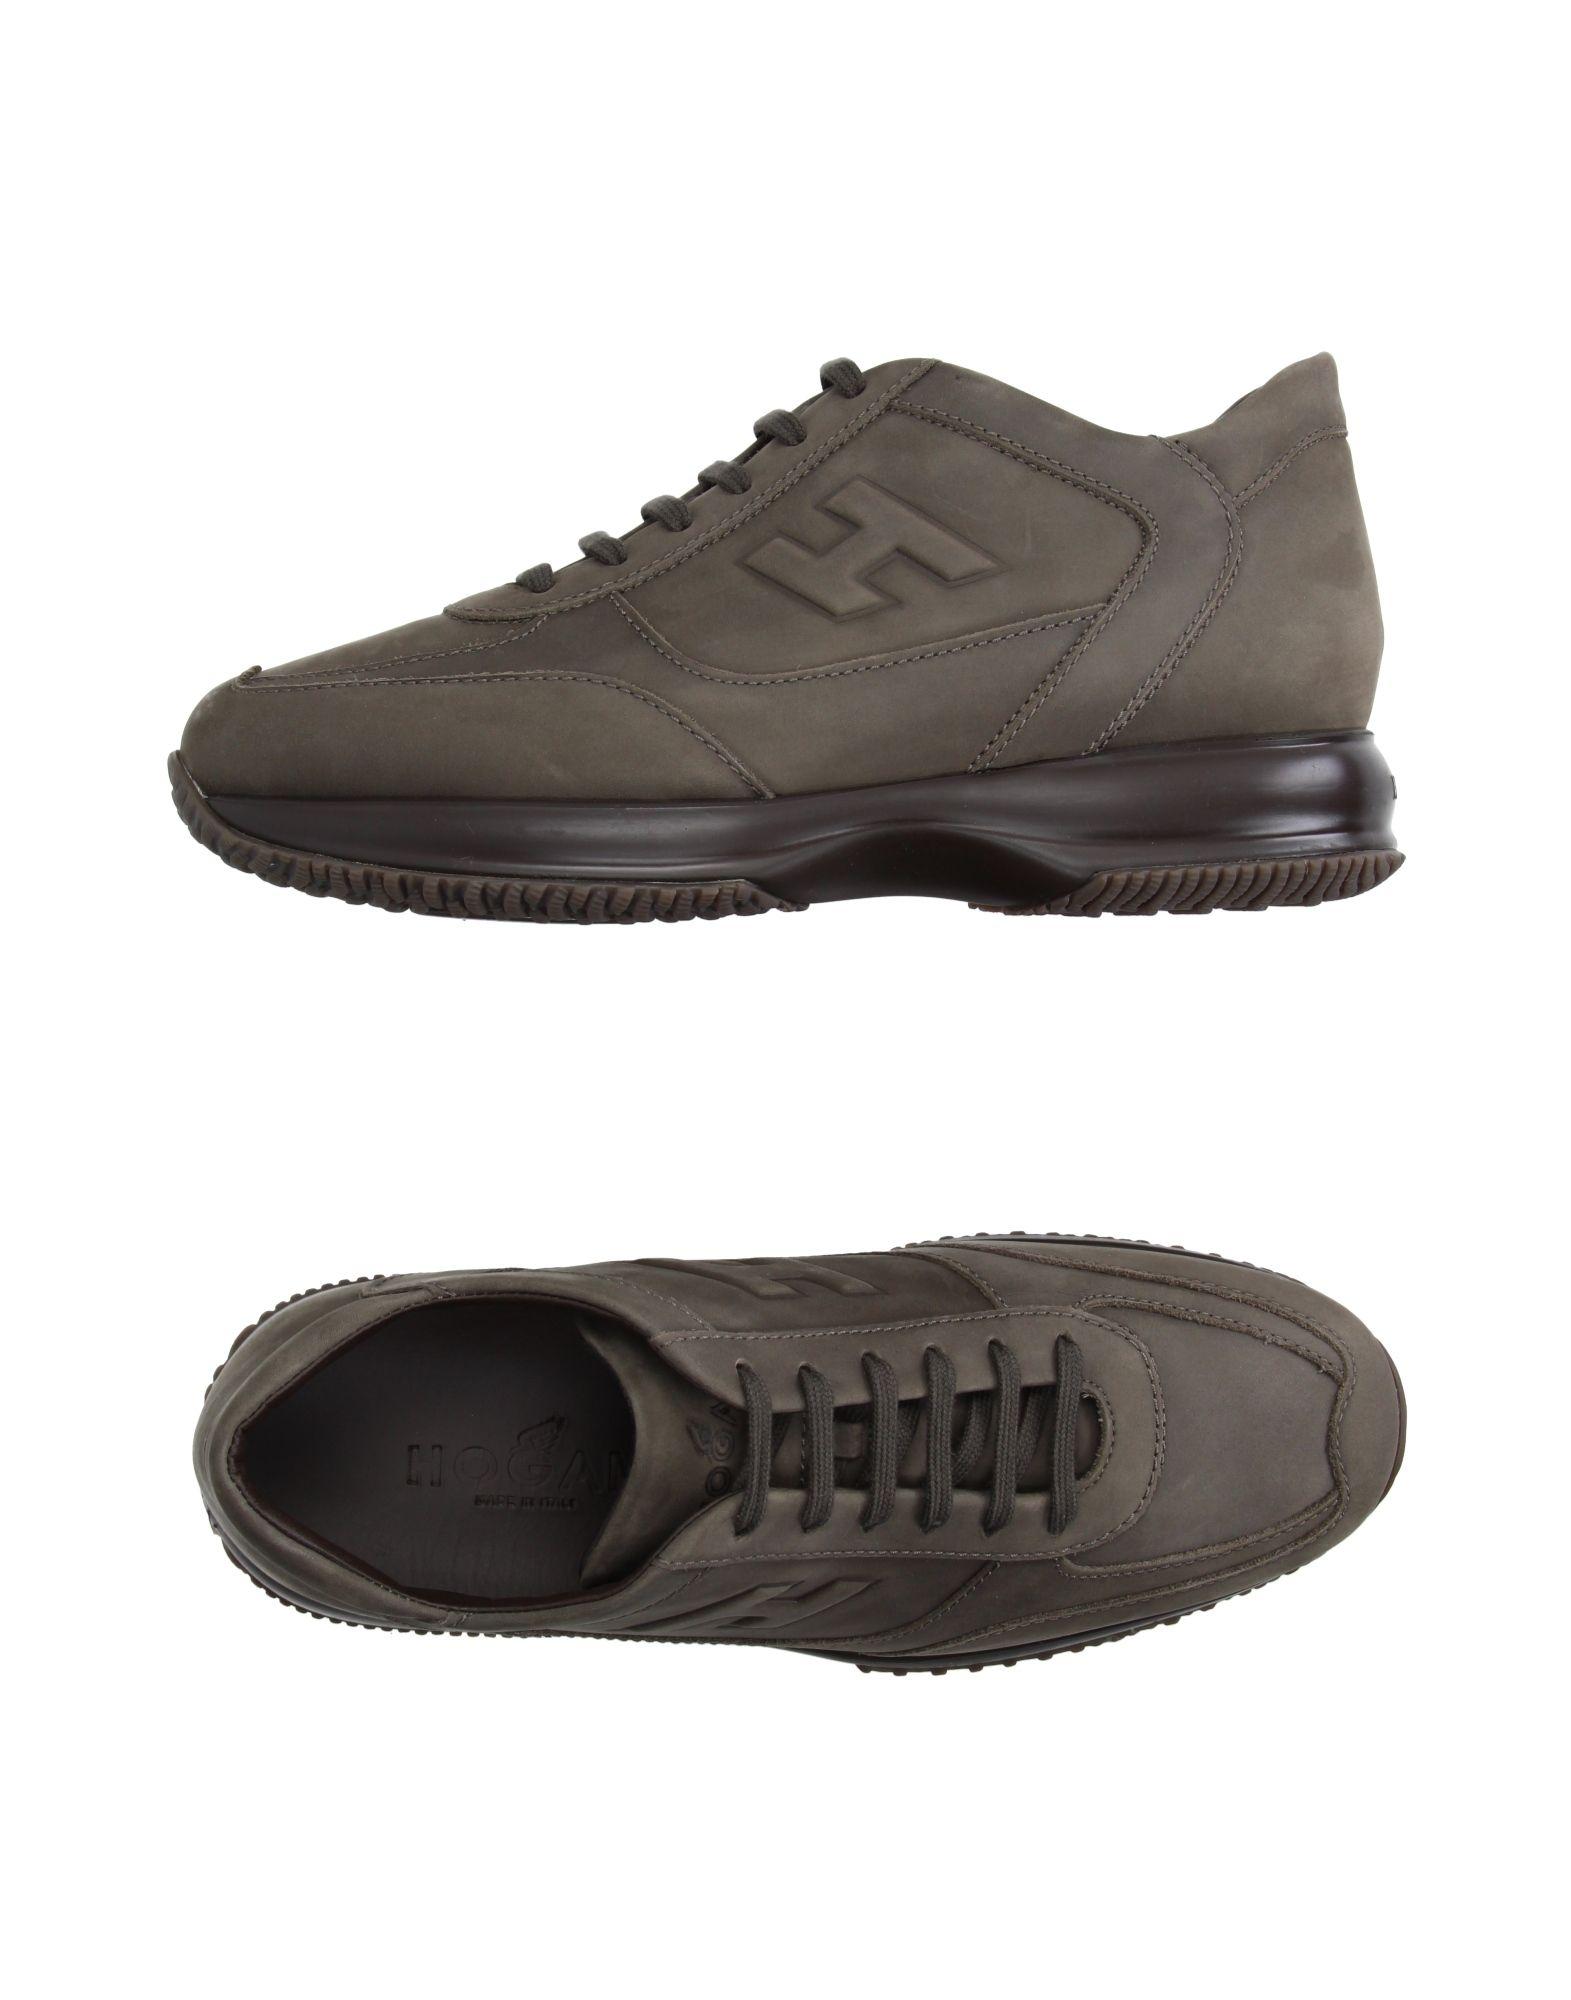 Hogan Sneakers Herren  beliebte 11087856MV Gute Qualität beliebte  Schuhe 84dce6